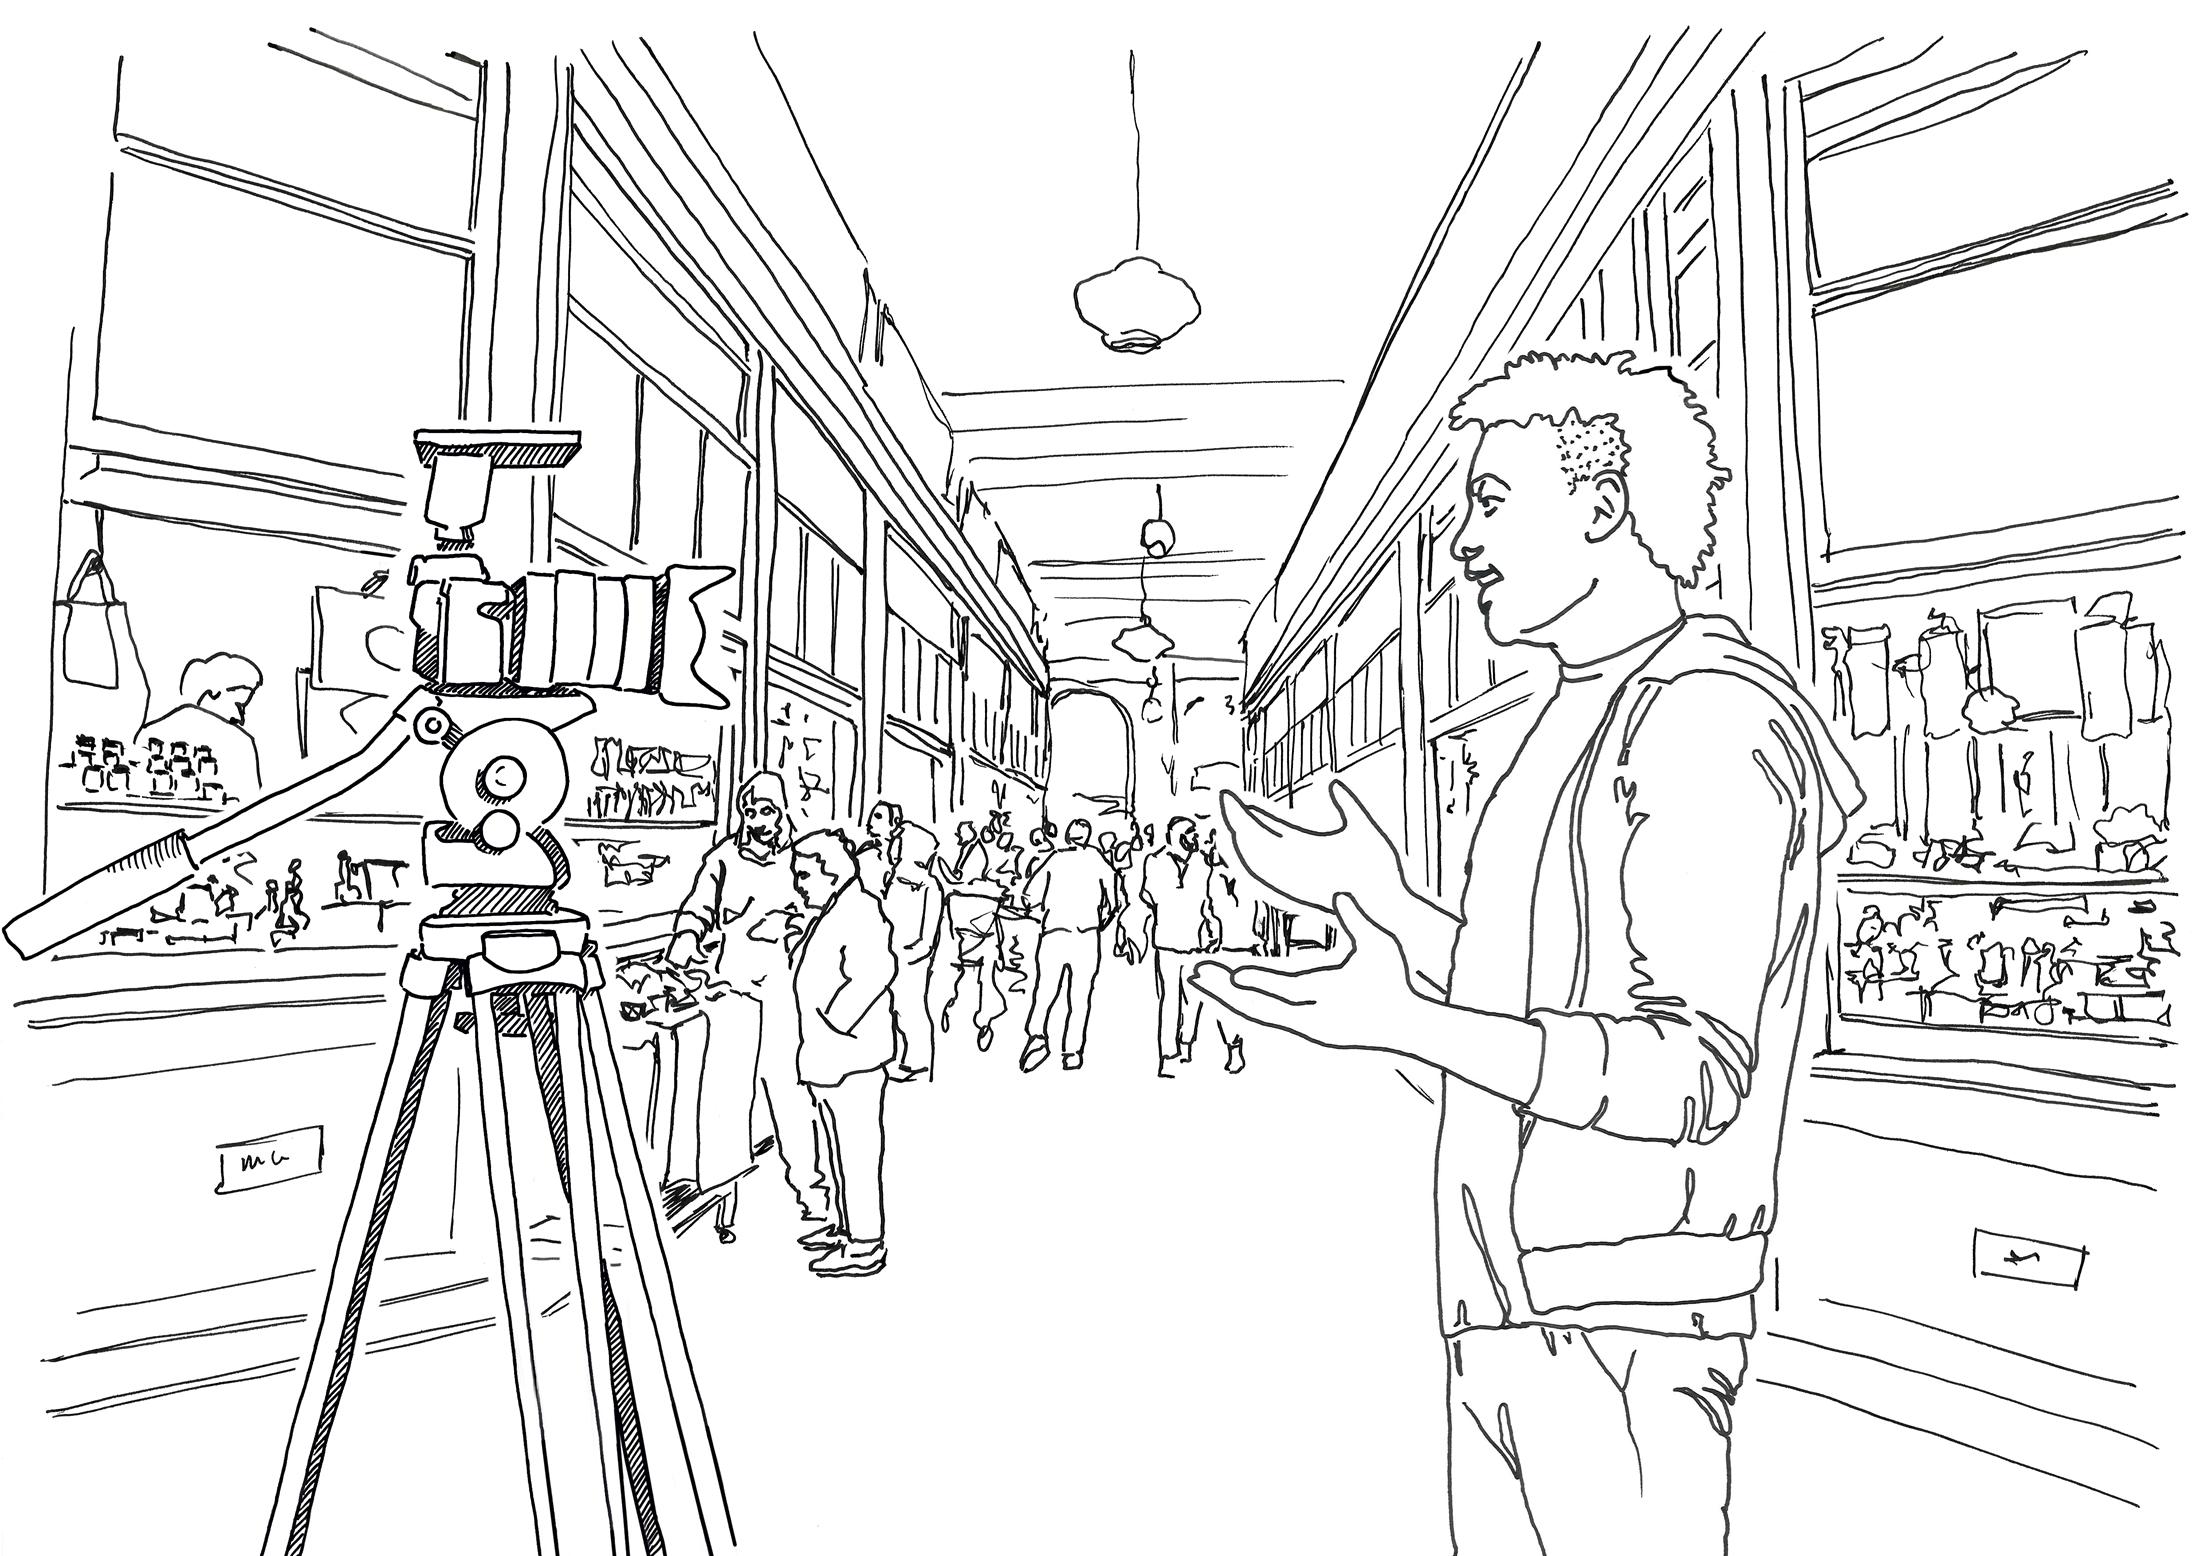 Illustration of Events Setting